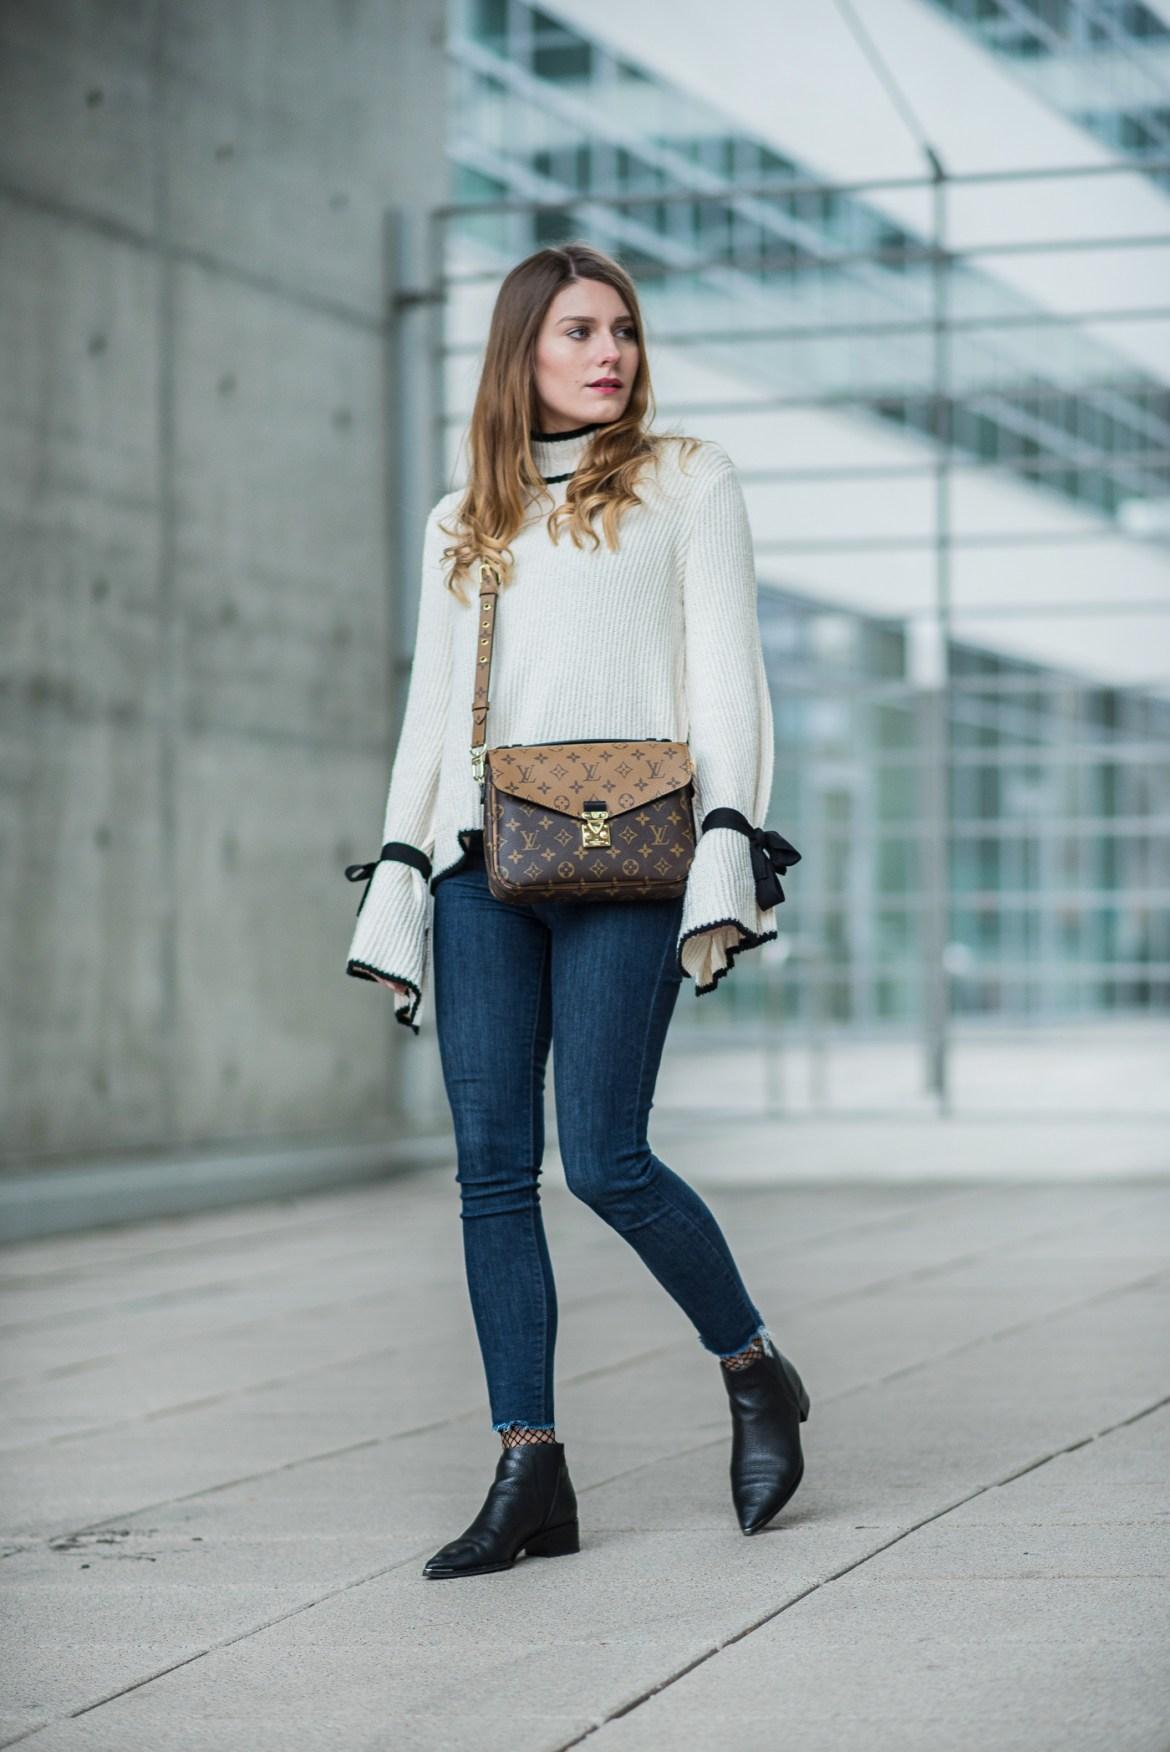 Louis Vuitton Pochette Metis Bag Hoard Of Trends